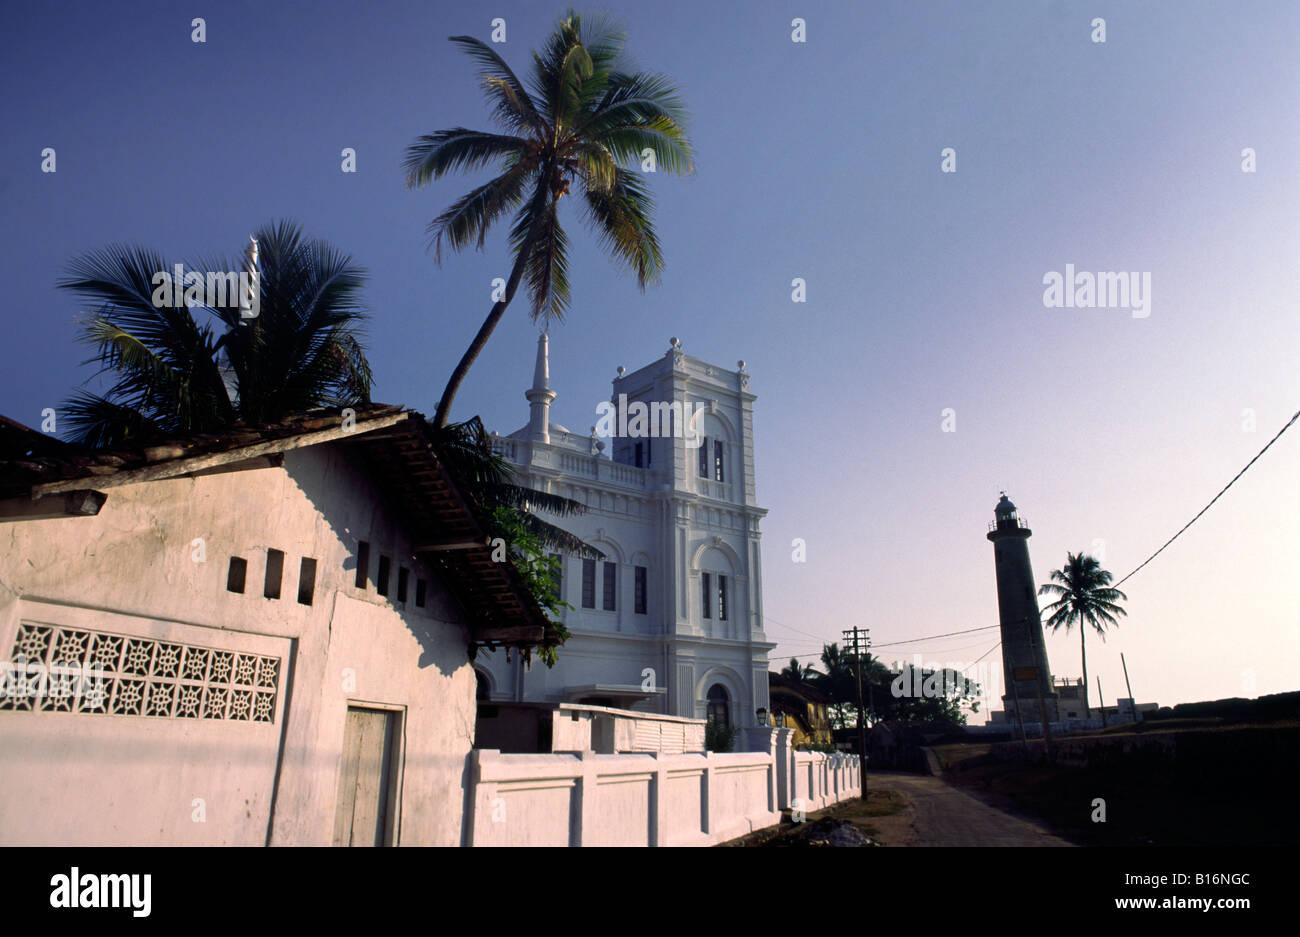 Fort Meeran Jumma Masjid Mosque and Galle light house. Galle, Sri Lanka. Stock Photo